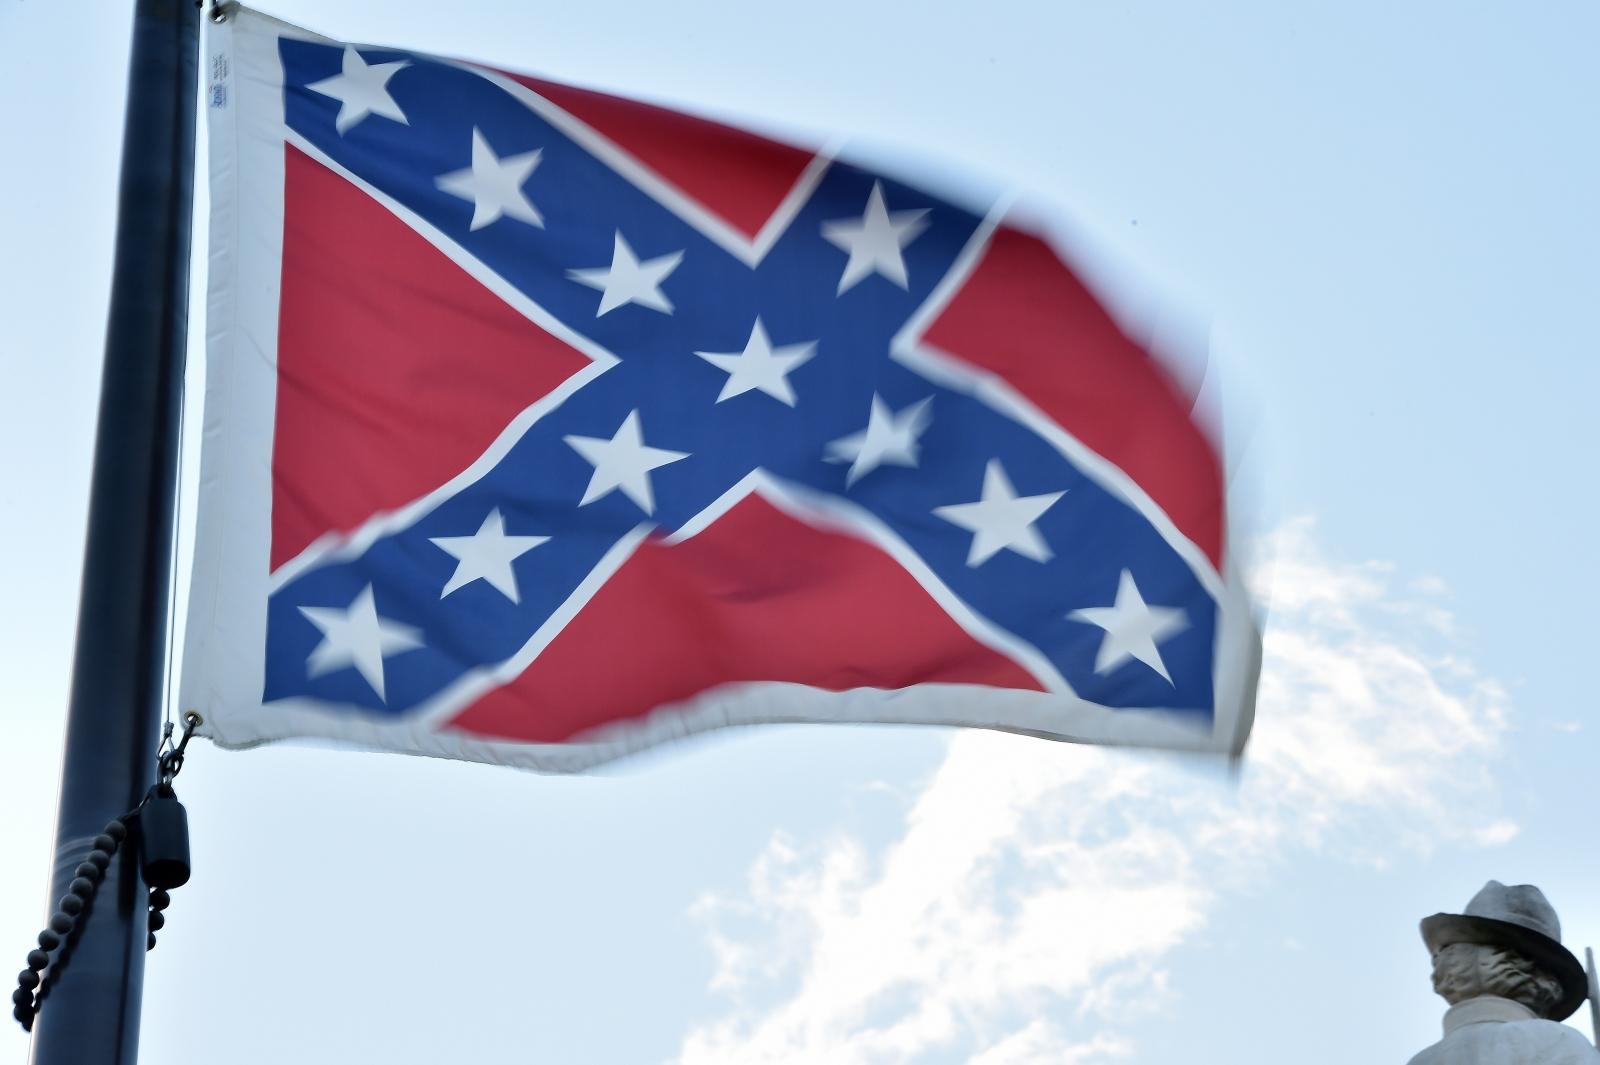 The Confederate flag flies outside South Carolina's